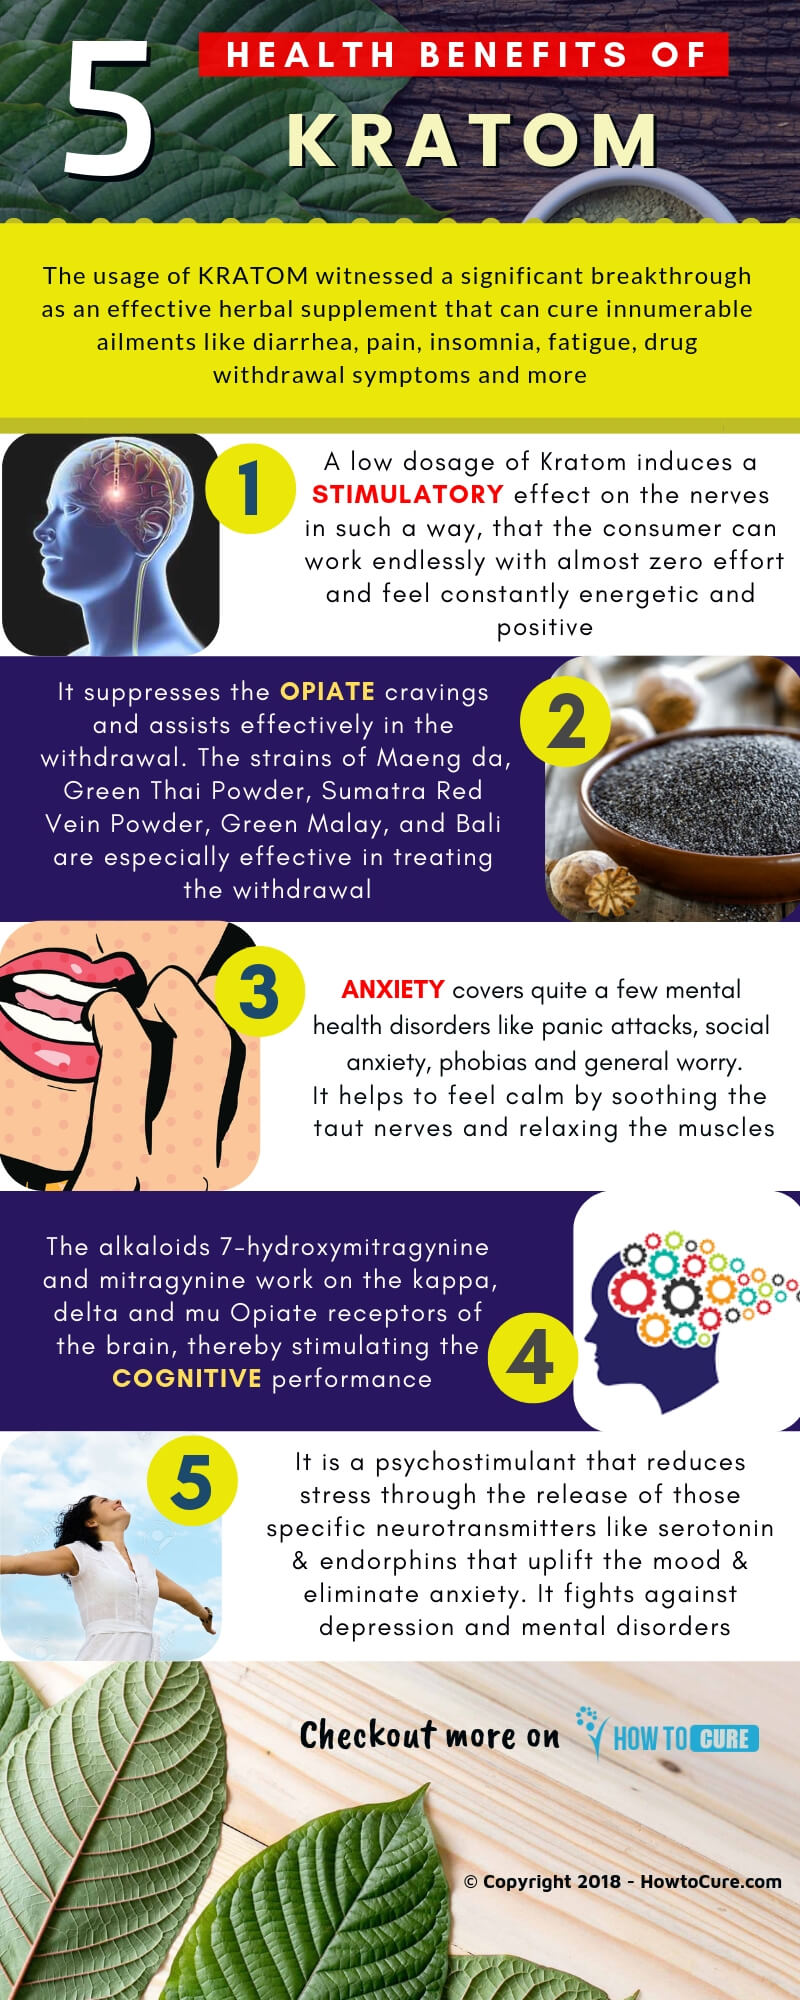 kratom benefits - infographic